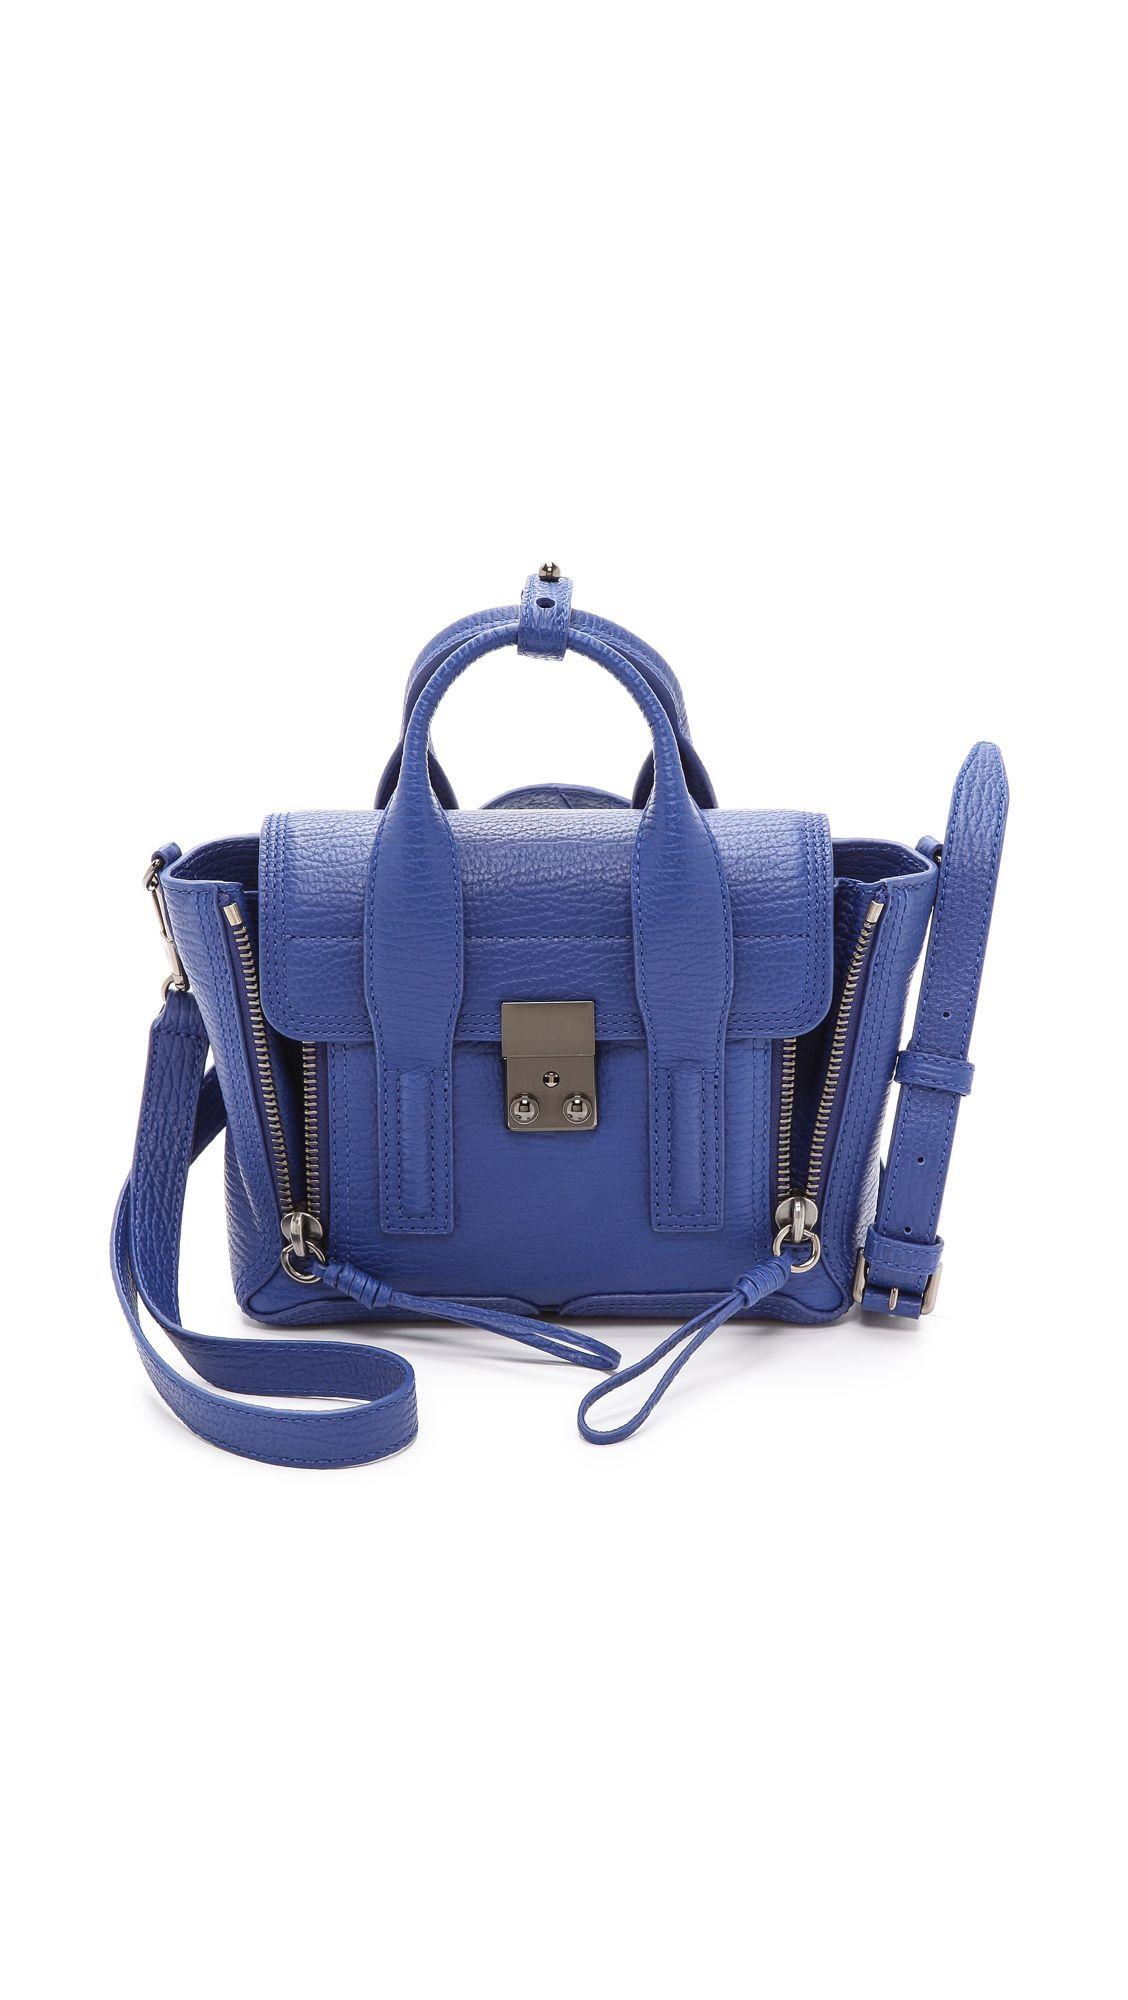 3.1 Phillip Lim Pashli Mini Satchel - Cobalt | SHOPBOP.COM saved by  #ShoppingIS